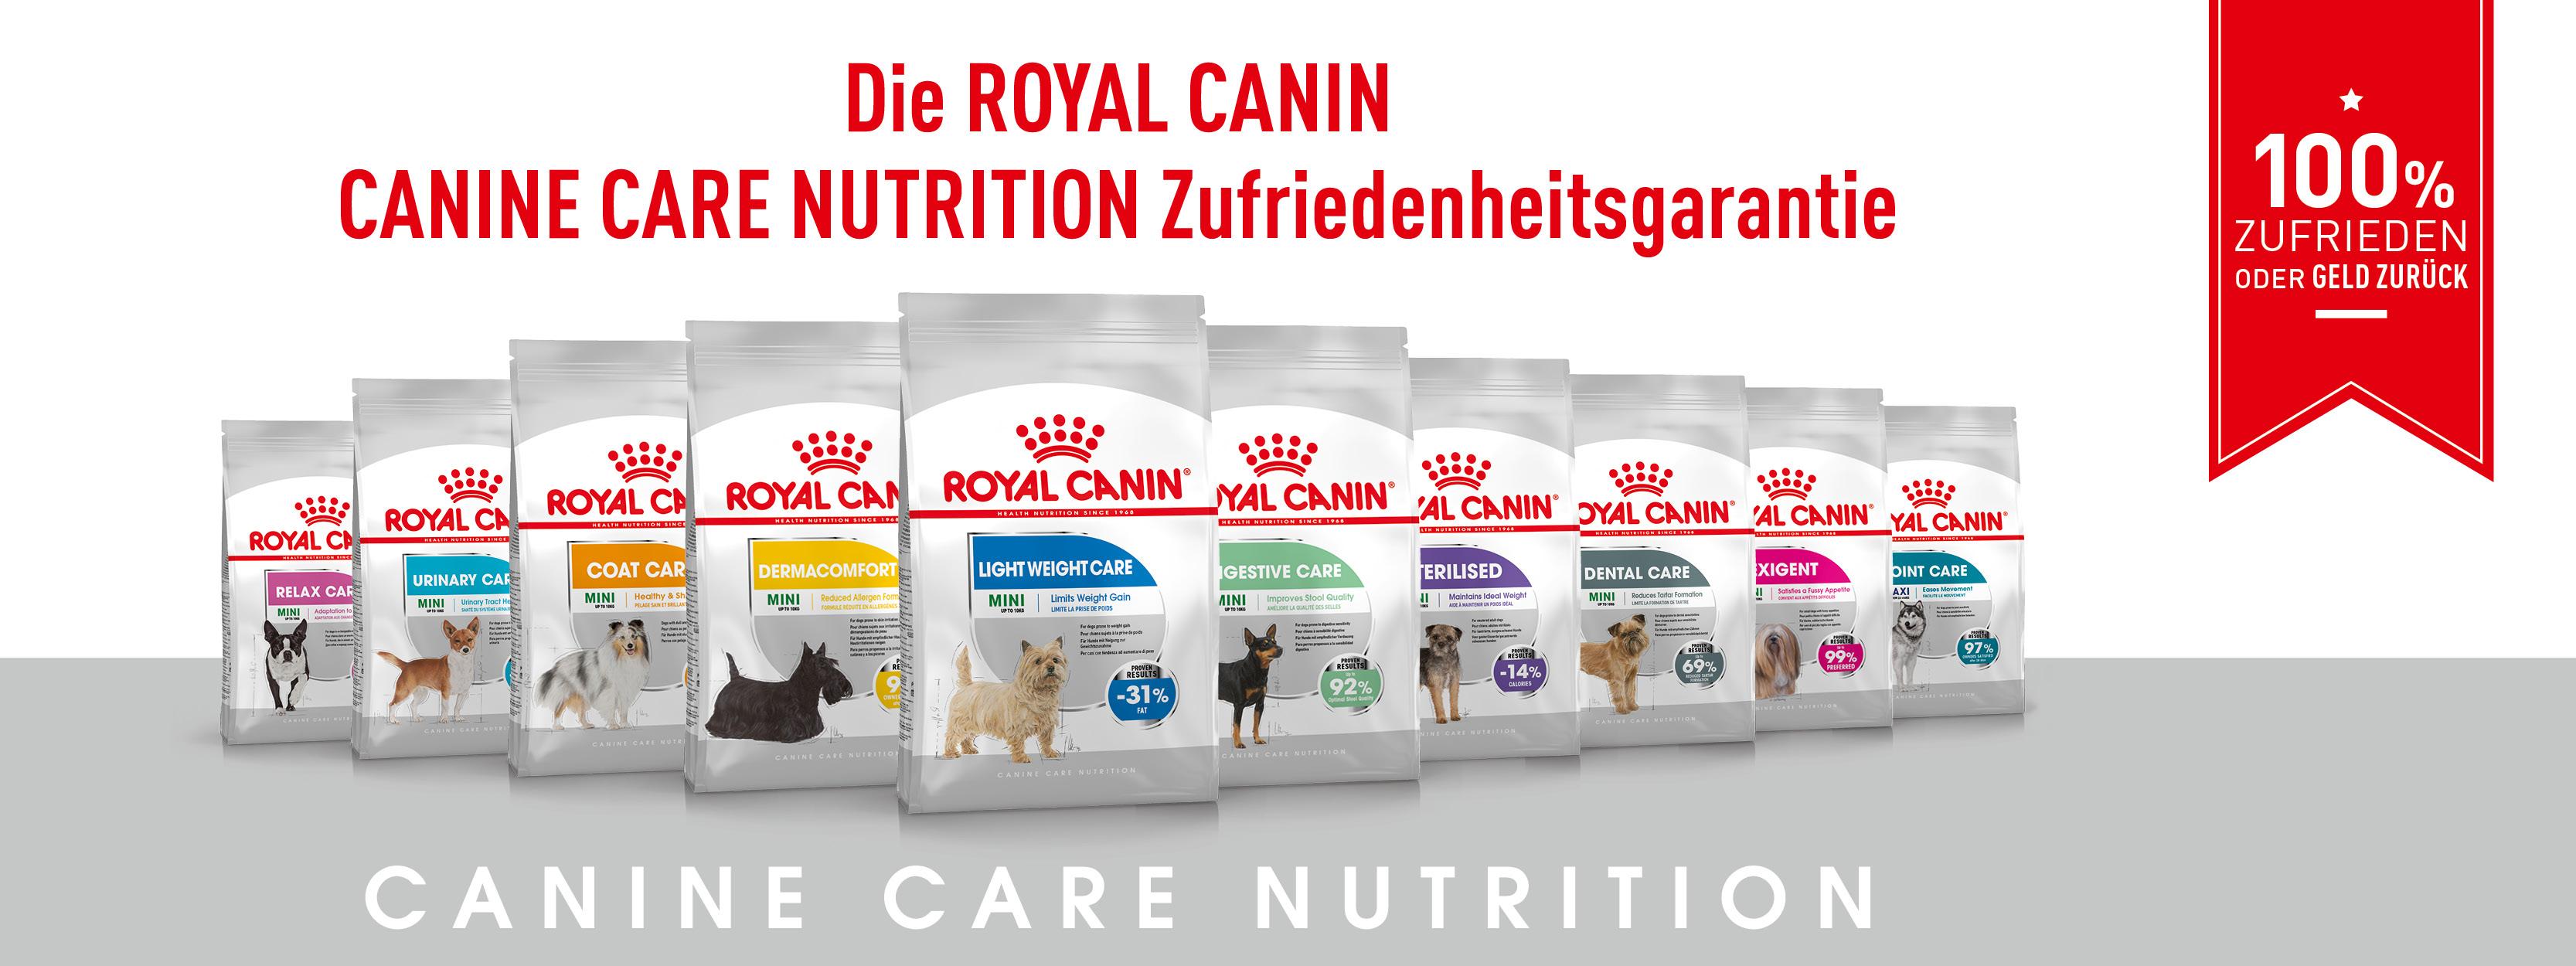 (GzG) Royal Canin Hundefutter 3kg GRATIS testen bei Unzufriedenheit